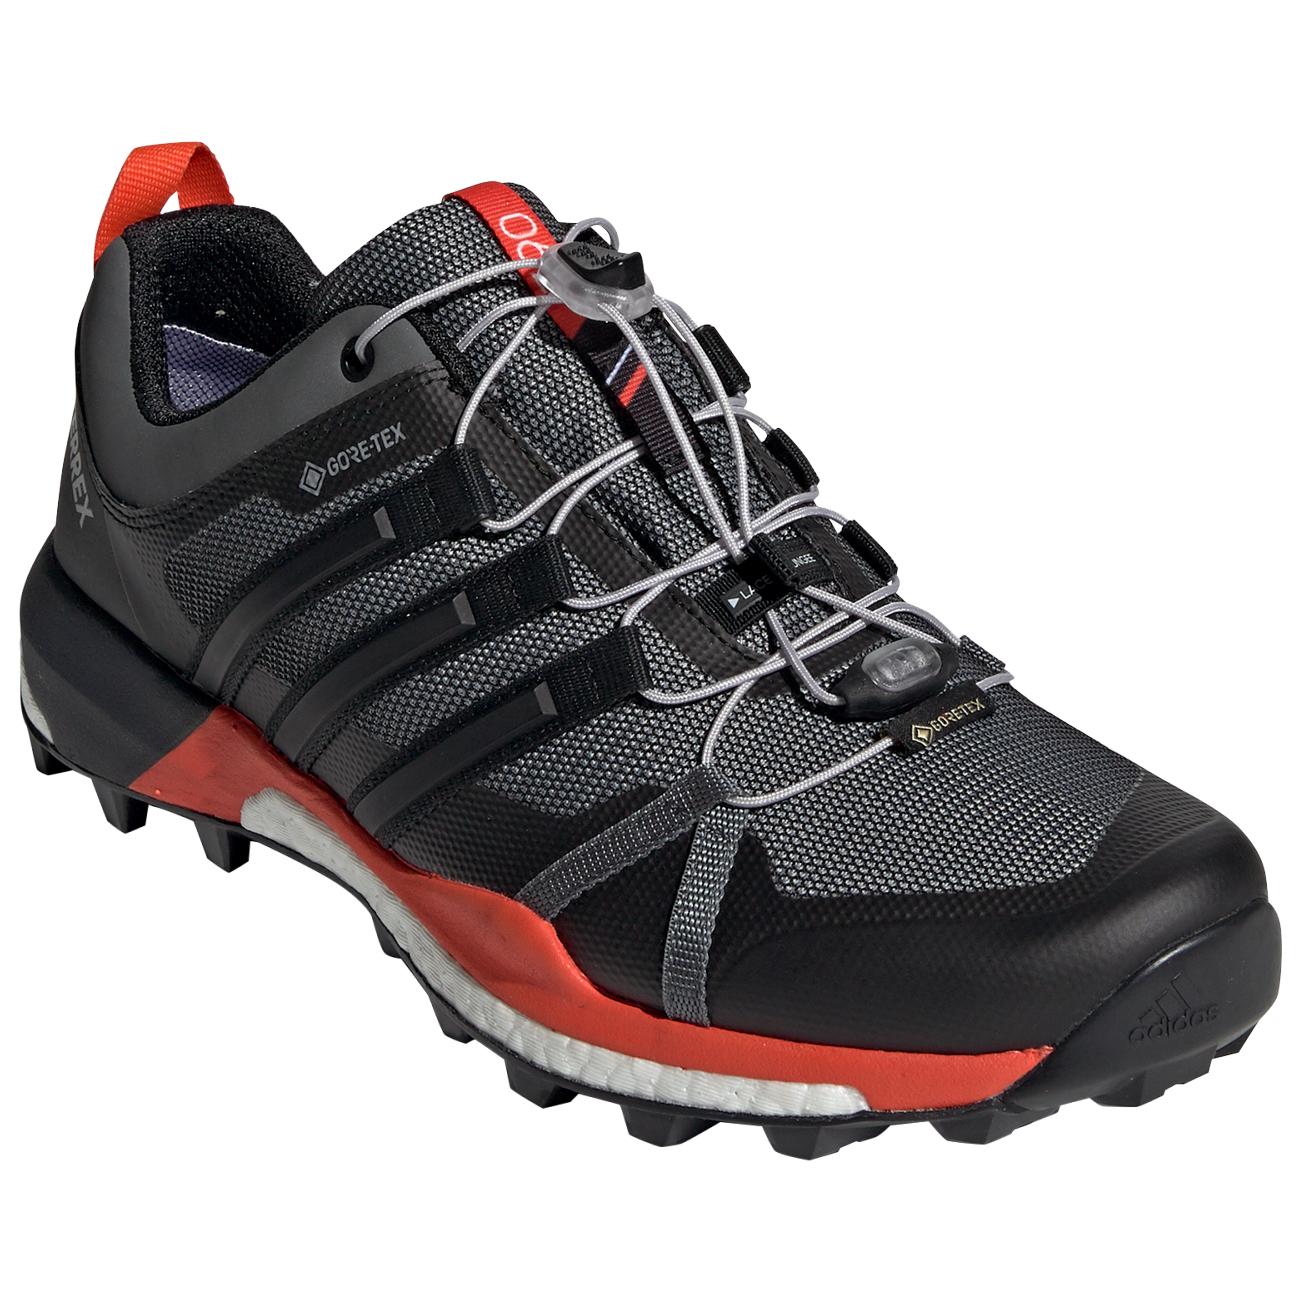 Adidas De Terrex Gtx Skychaser Chaussures Trail CrdxstBhQ